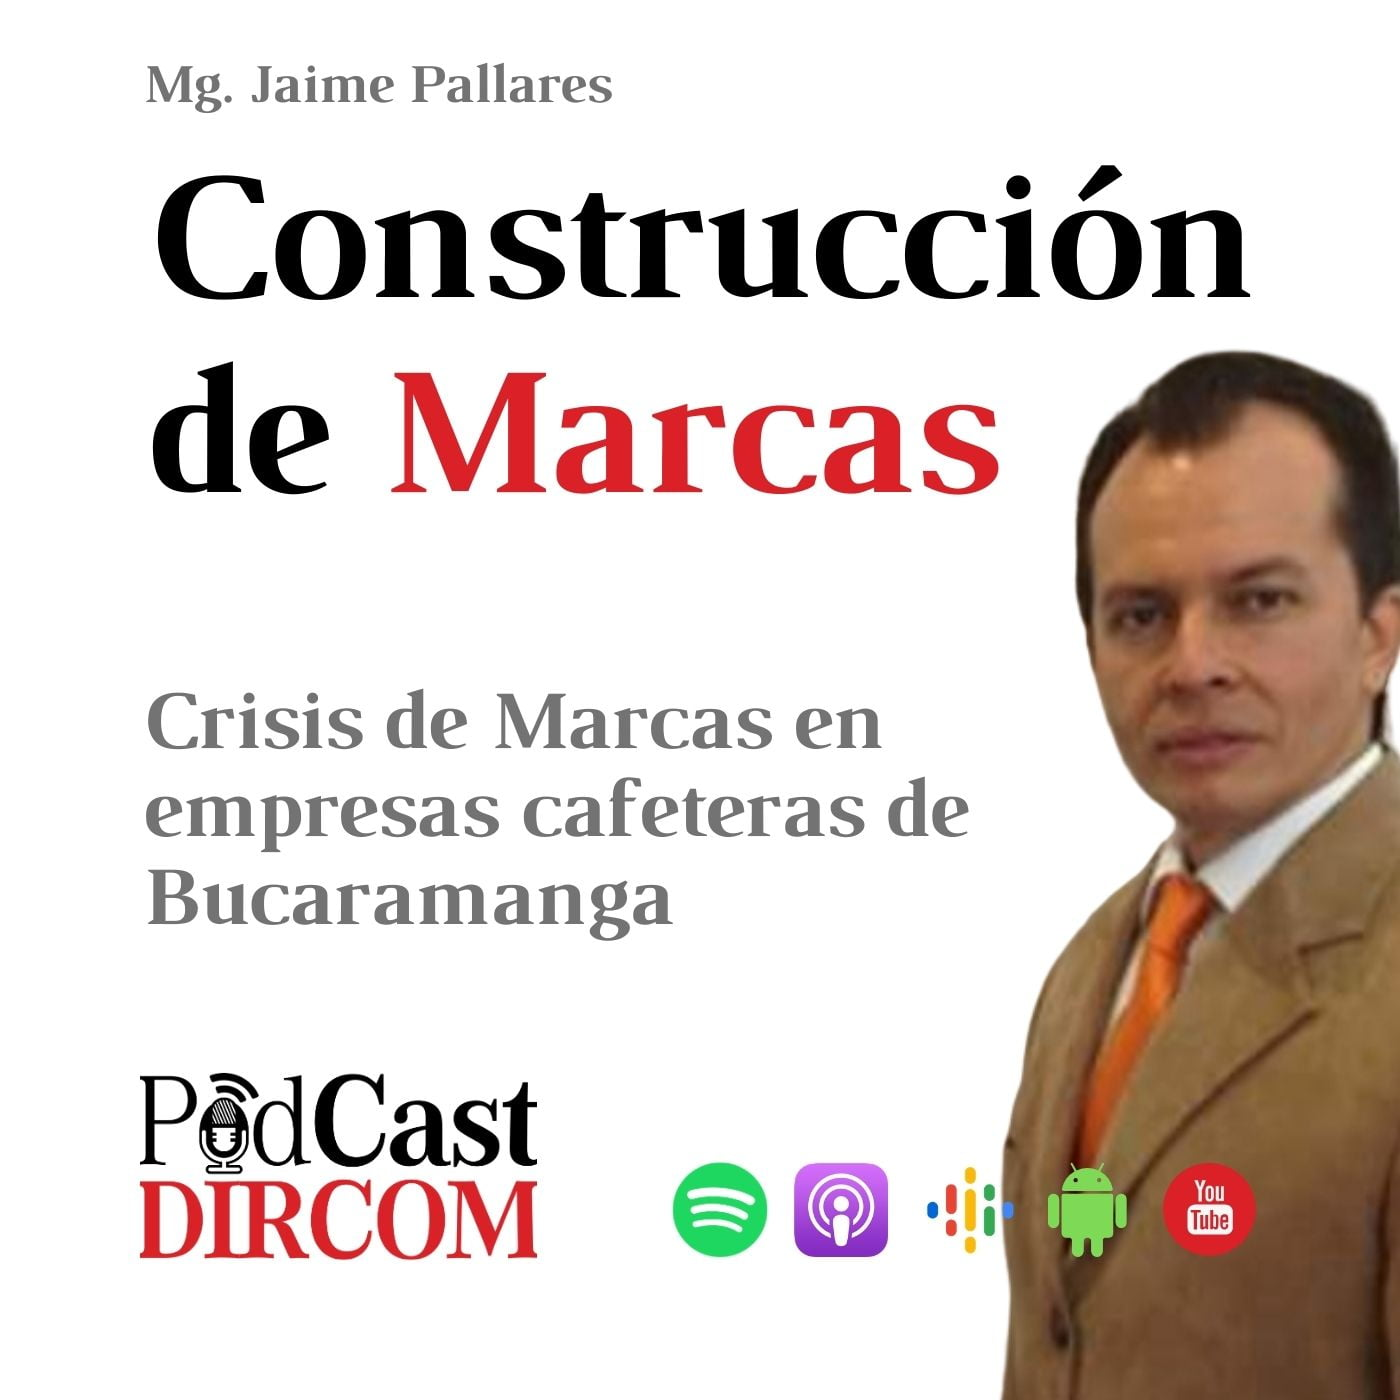 Construcción de Marcas Jaime Pallares